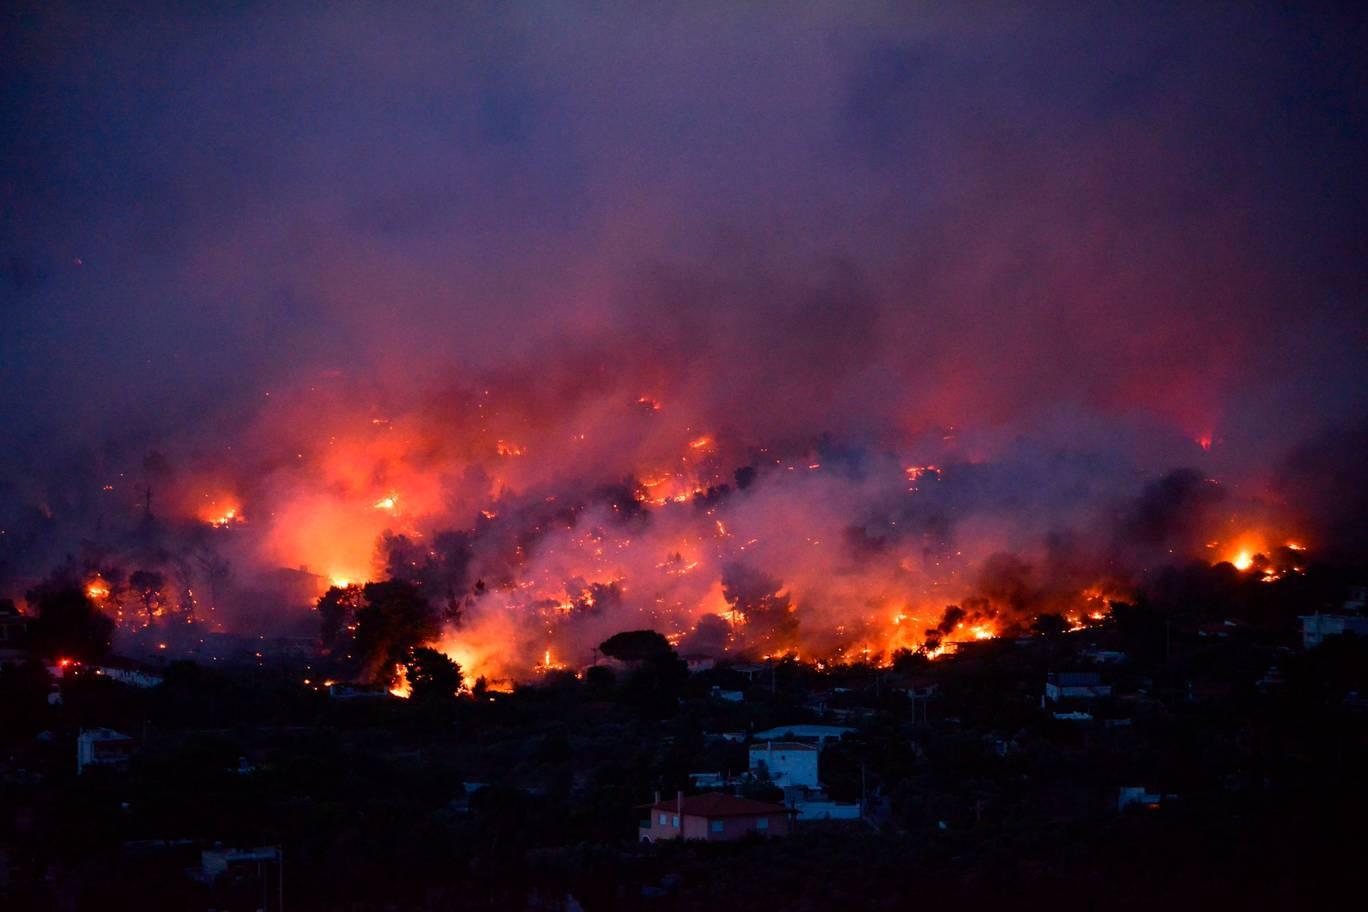 greeceforestfire2407d.jpg